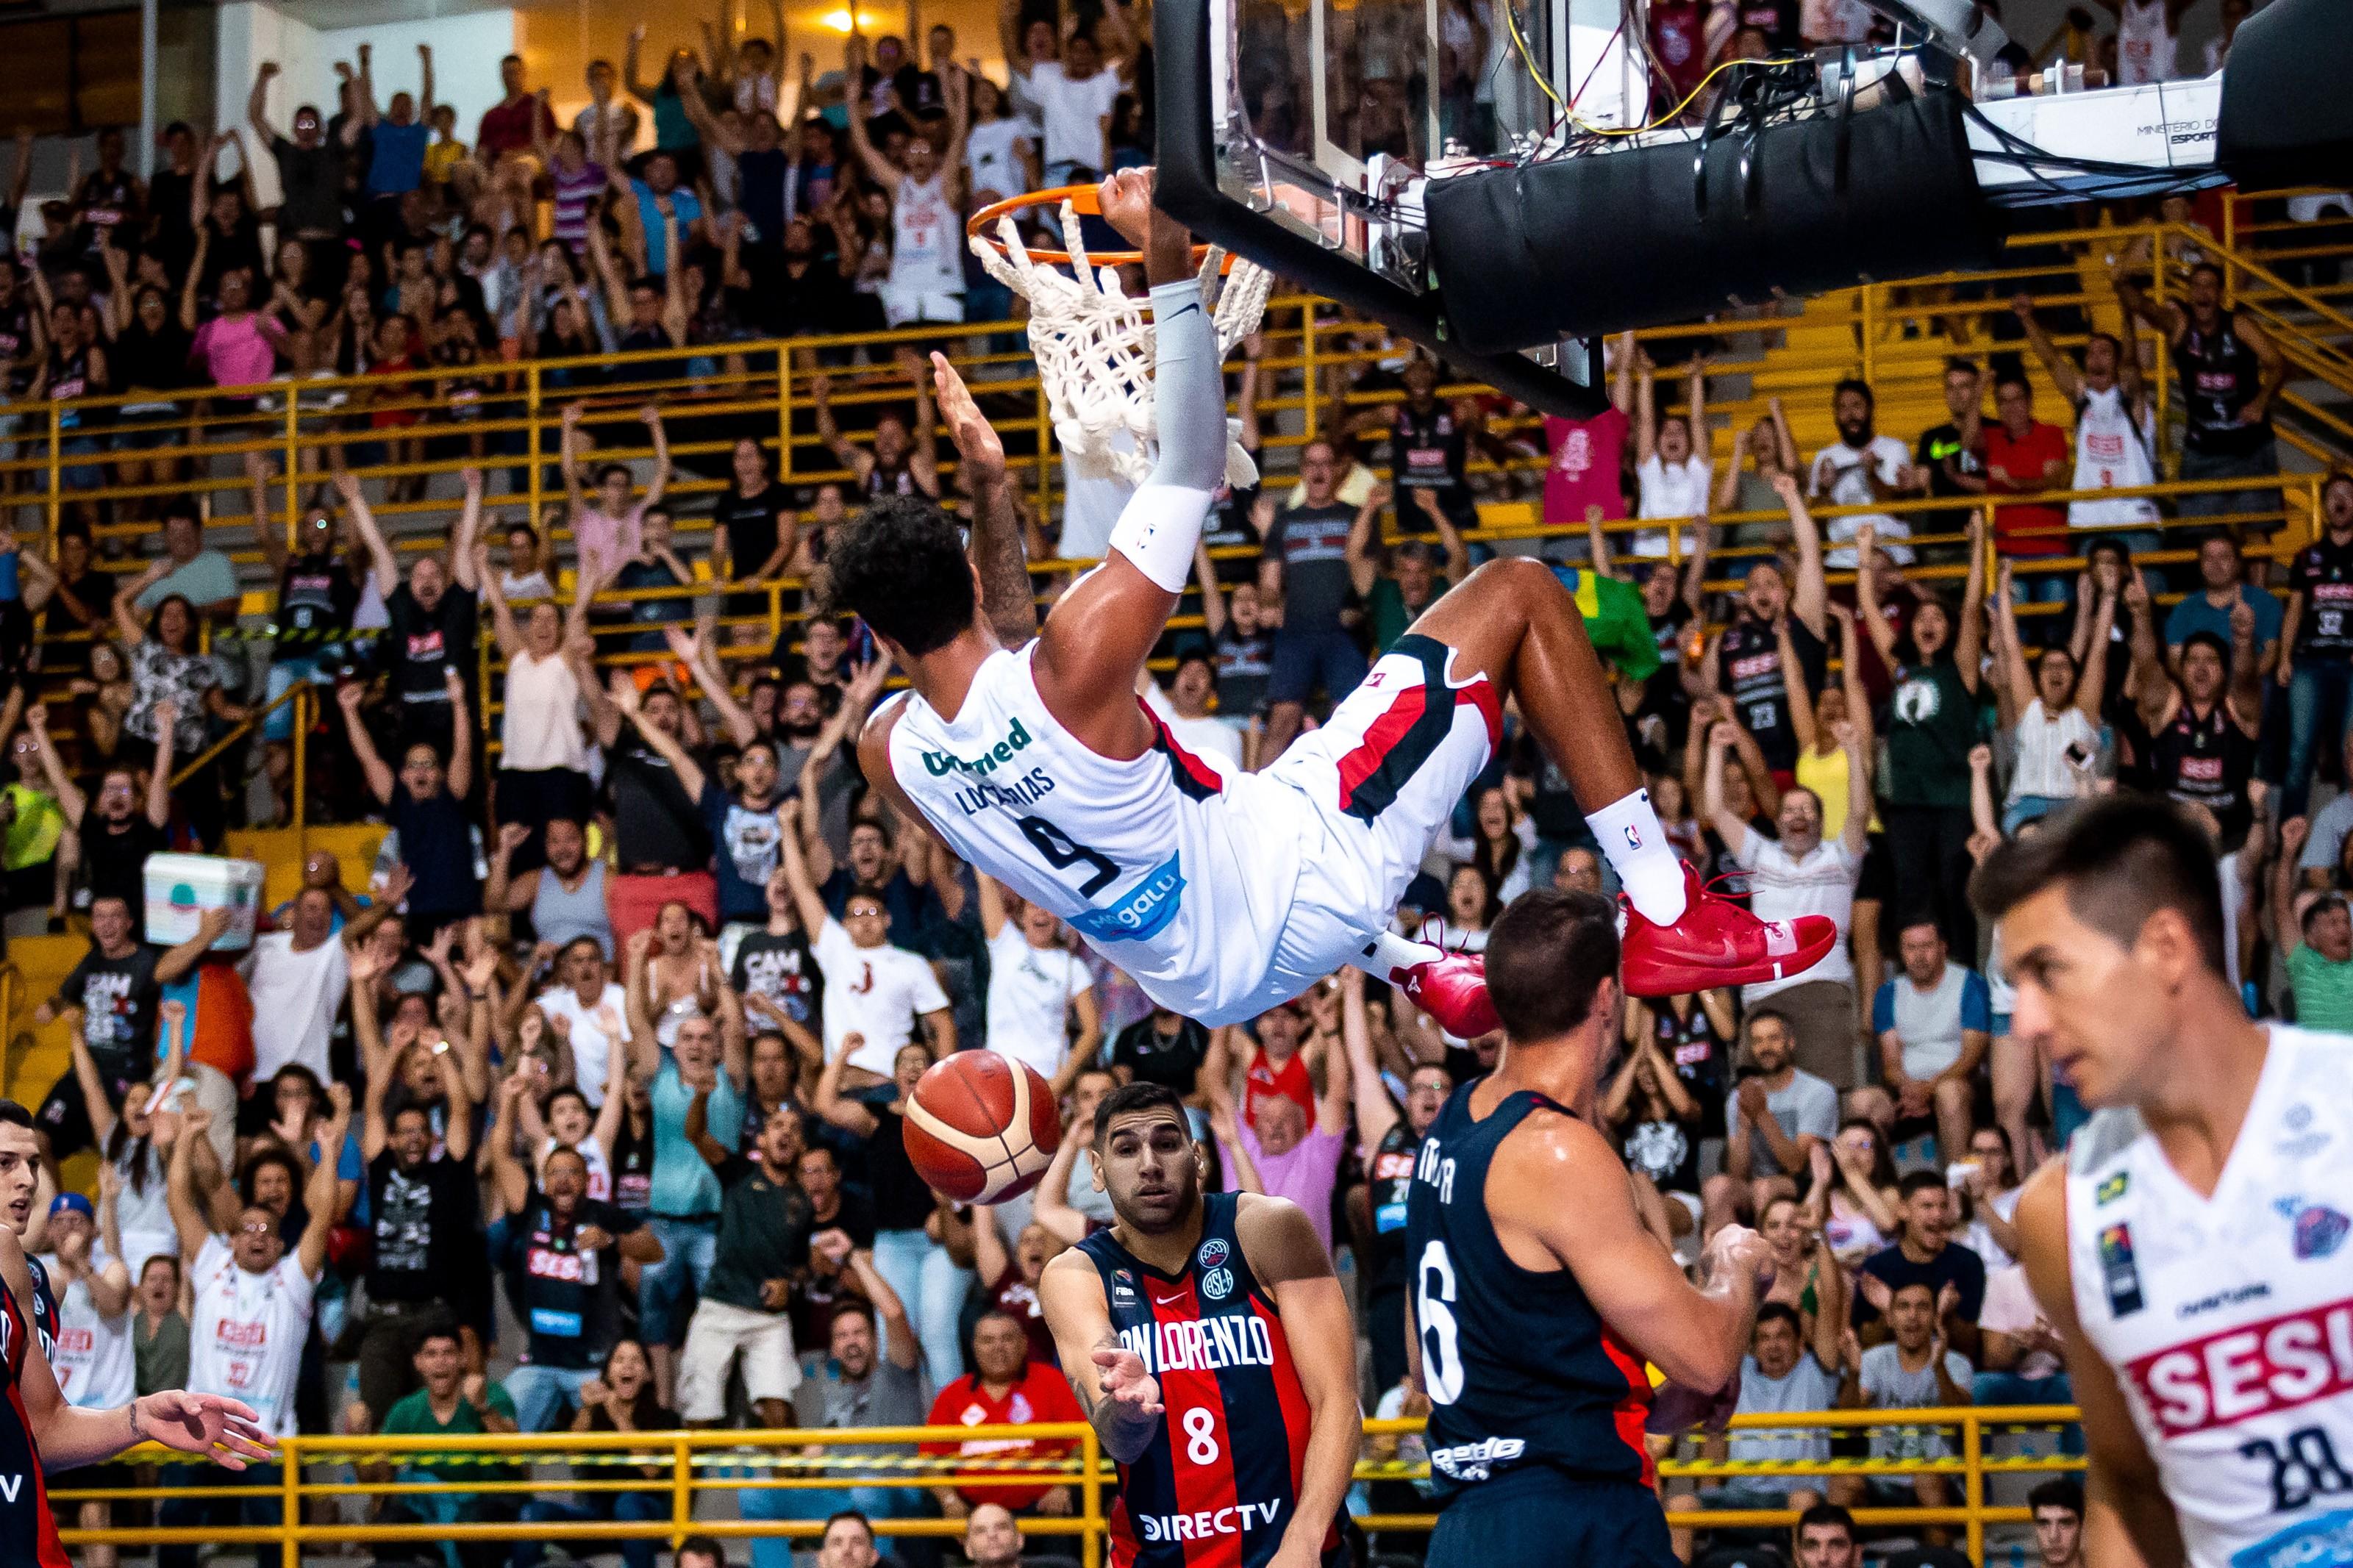 Com ótima defesa, Sesi Franca Basquete vence San Lorenzo